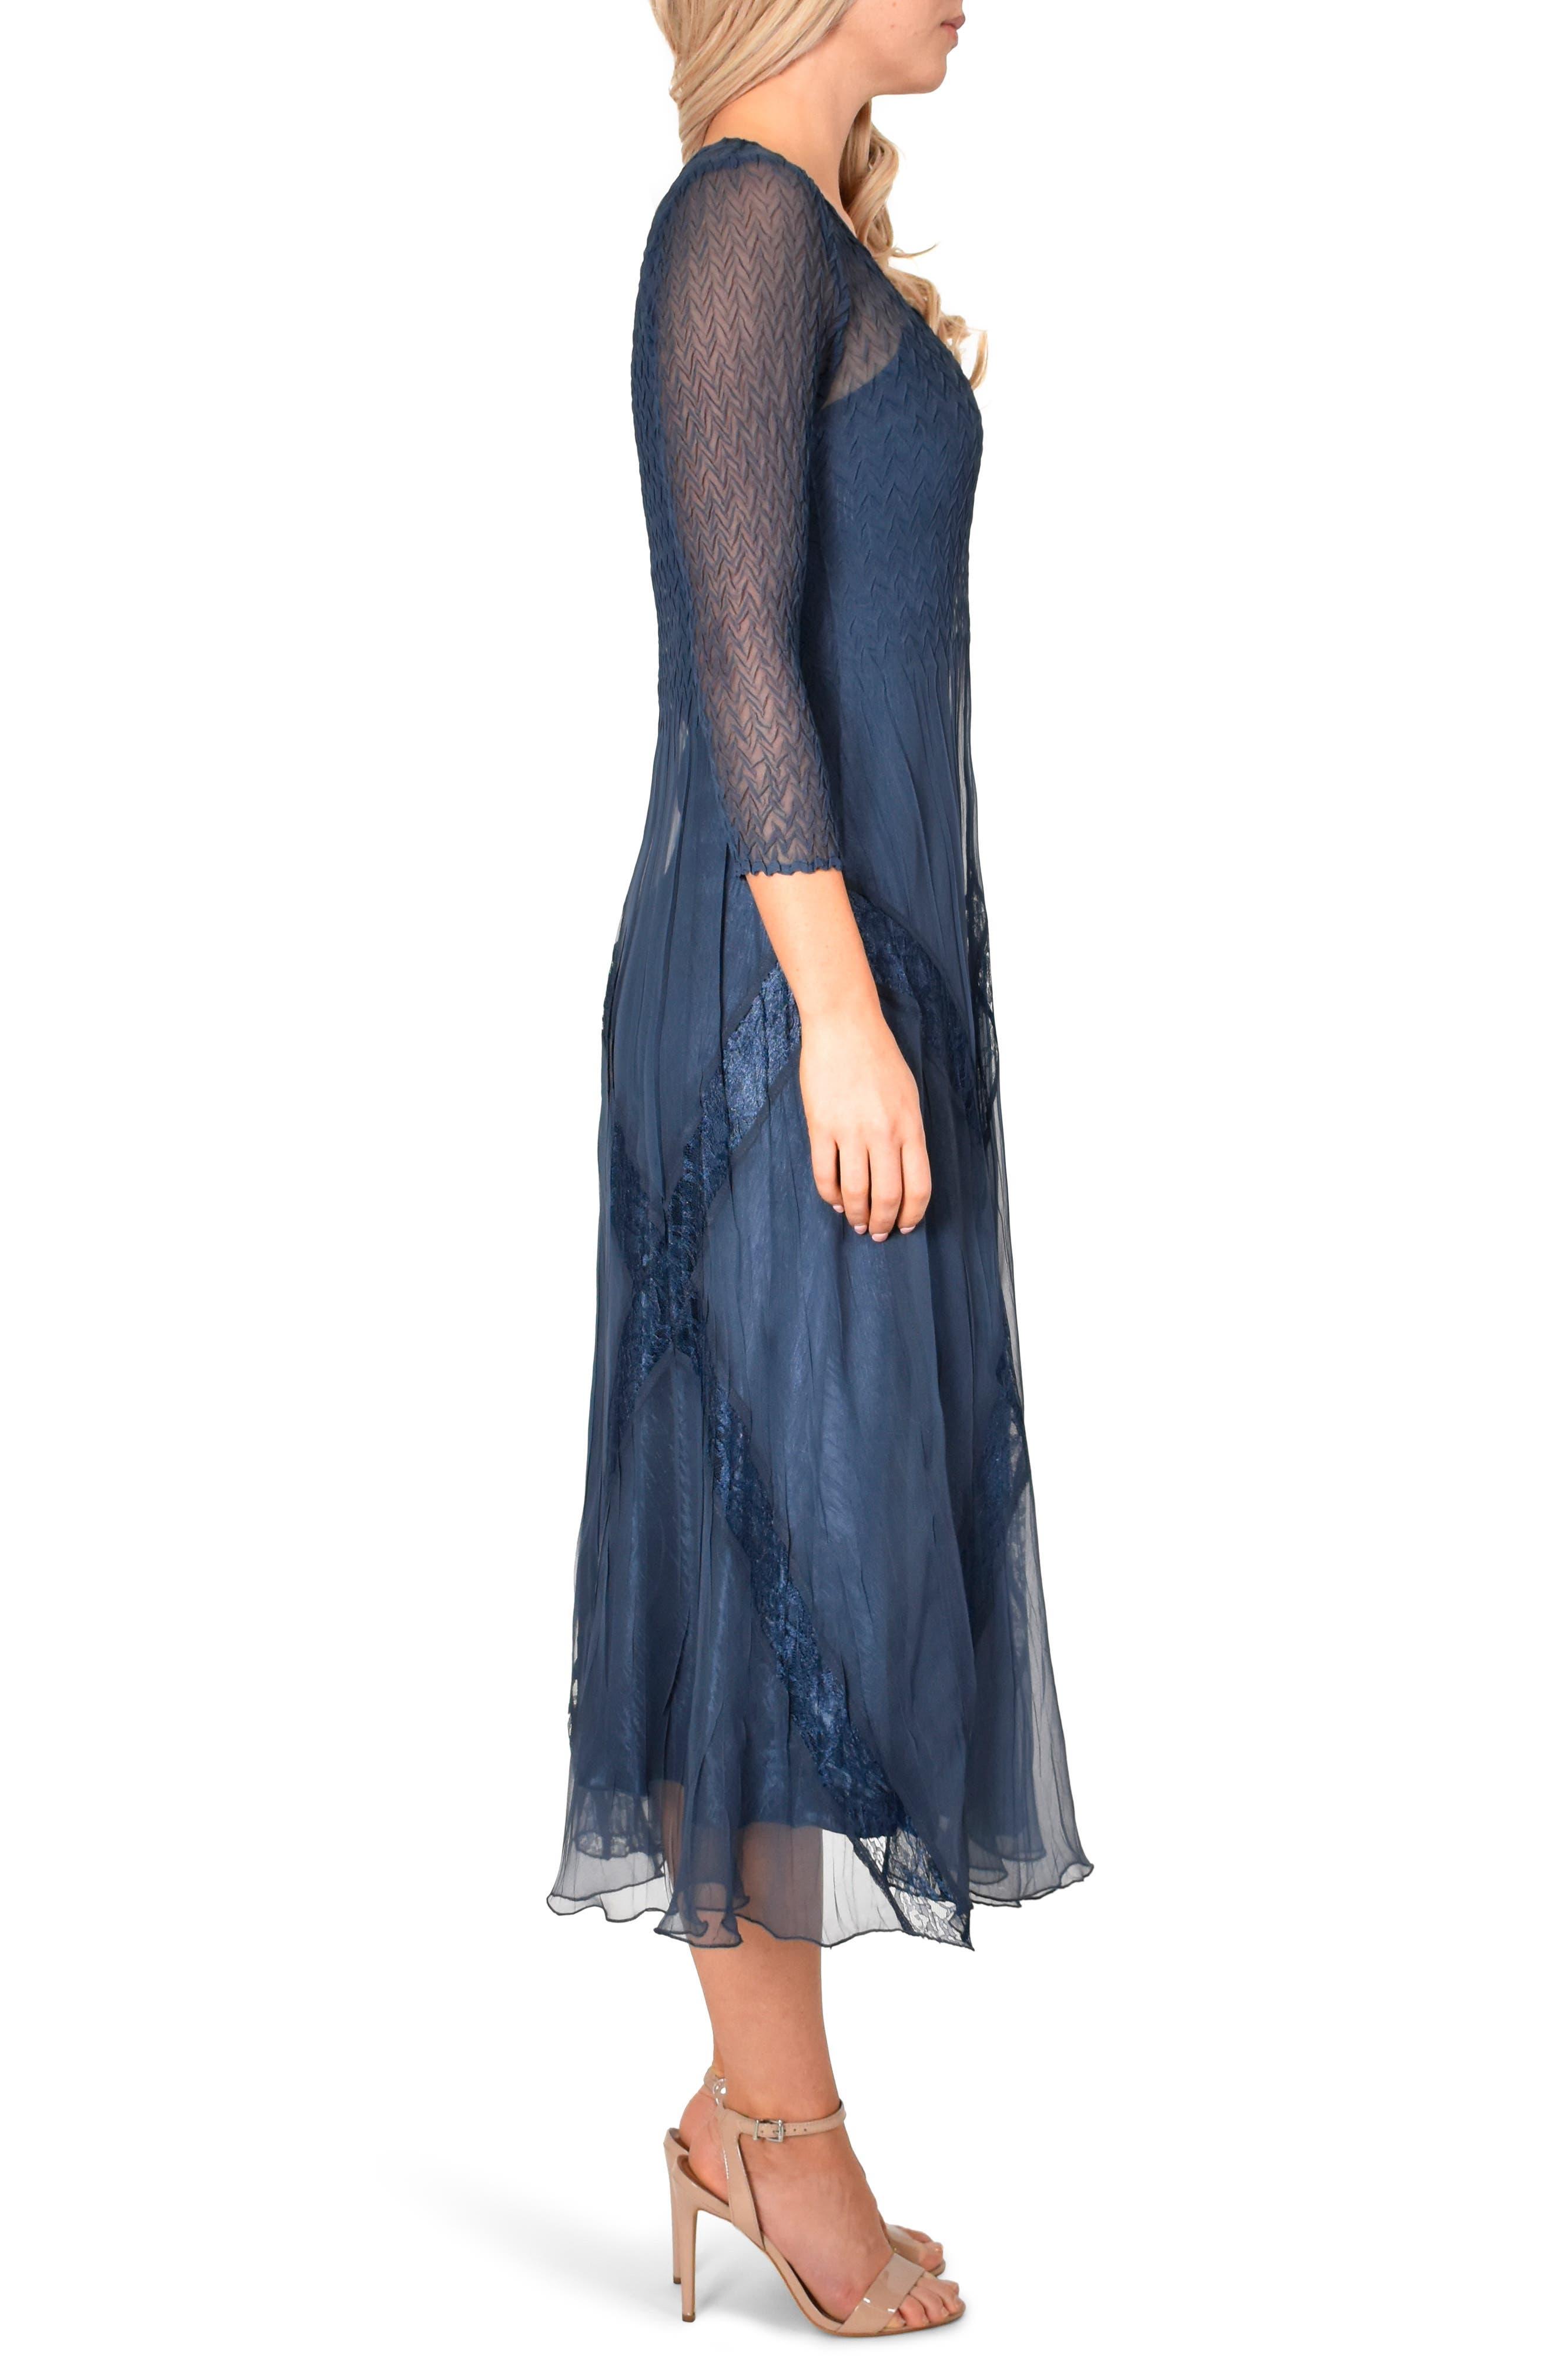 KOMAROV, Beaded Chiffon A-Line Dress, Alternate thumbnail 4, color, 400